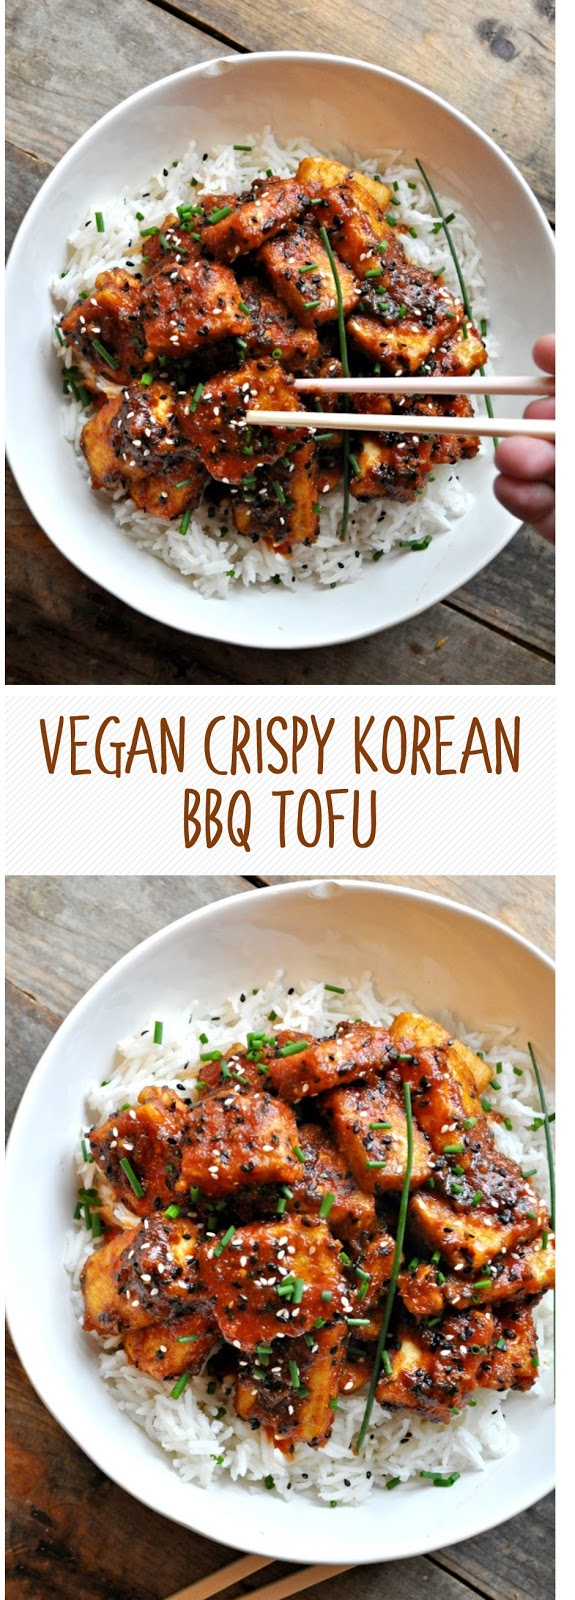 Vegan Crispy Korean BBQ Tofu